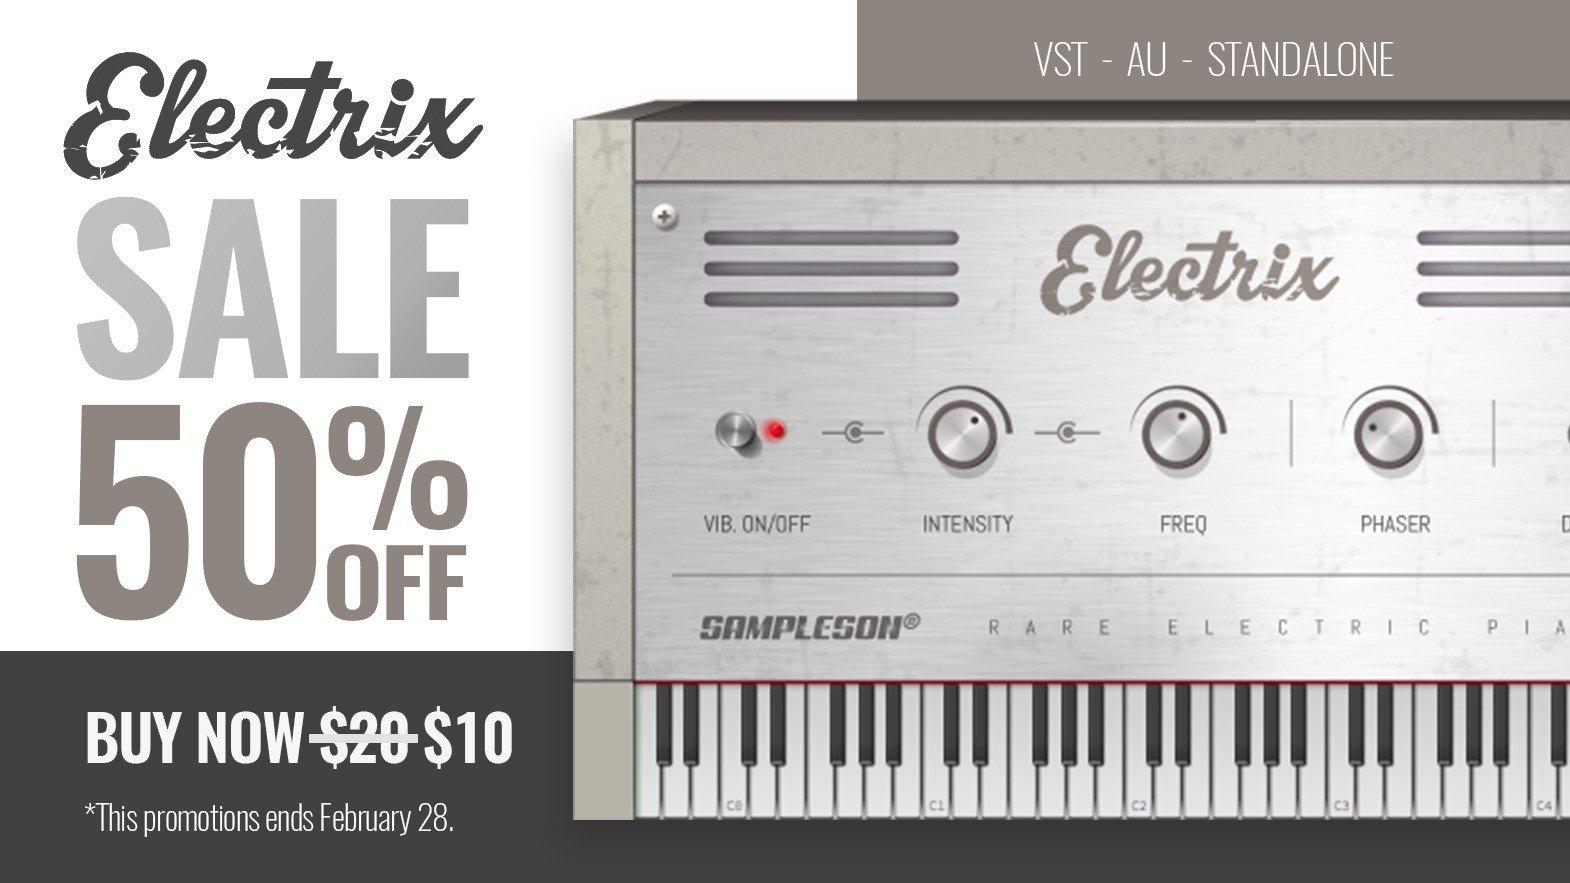 Electrix Sale